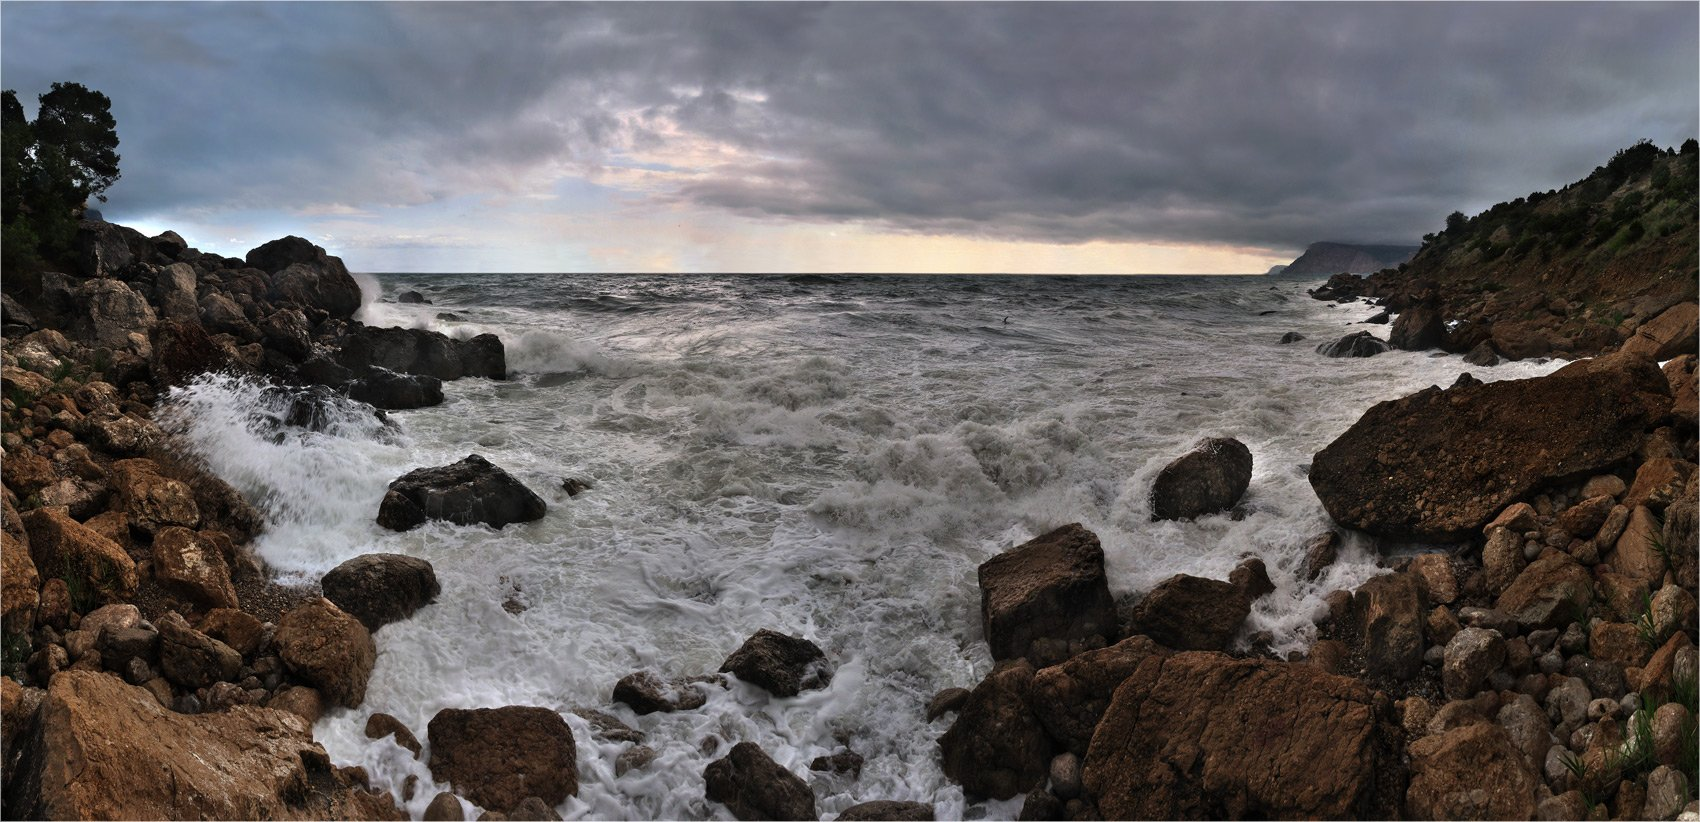 море, крым, шторм, инжир, ай-я, Kolebidenko Vladimir